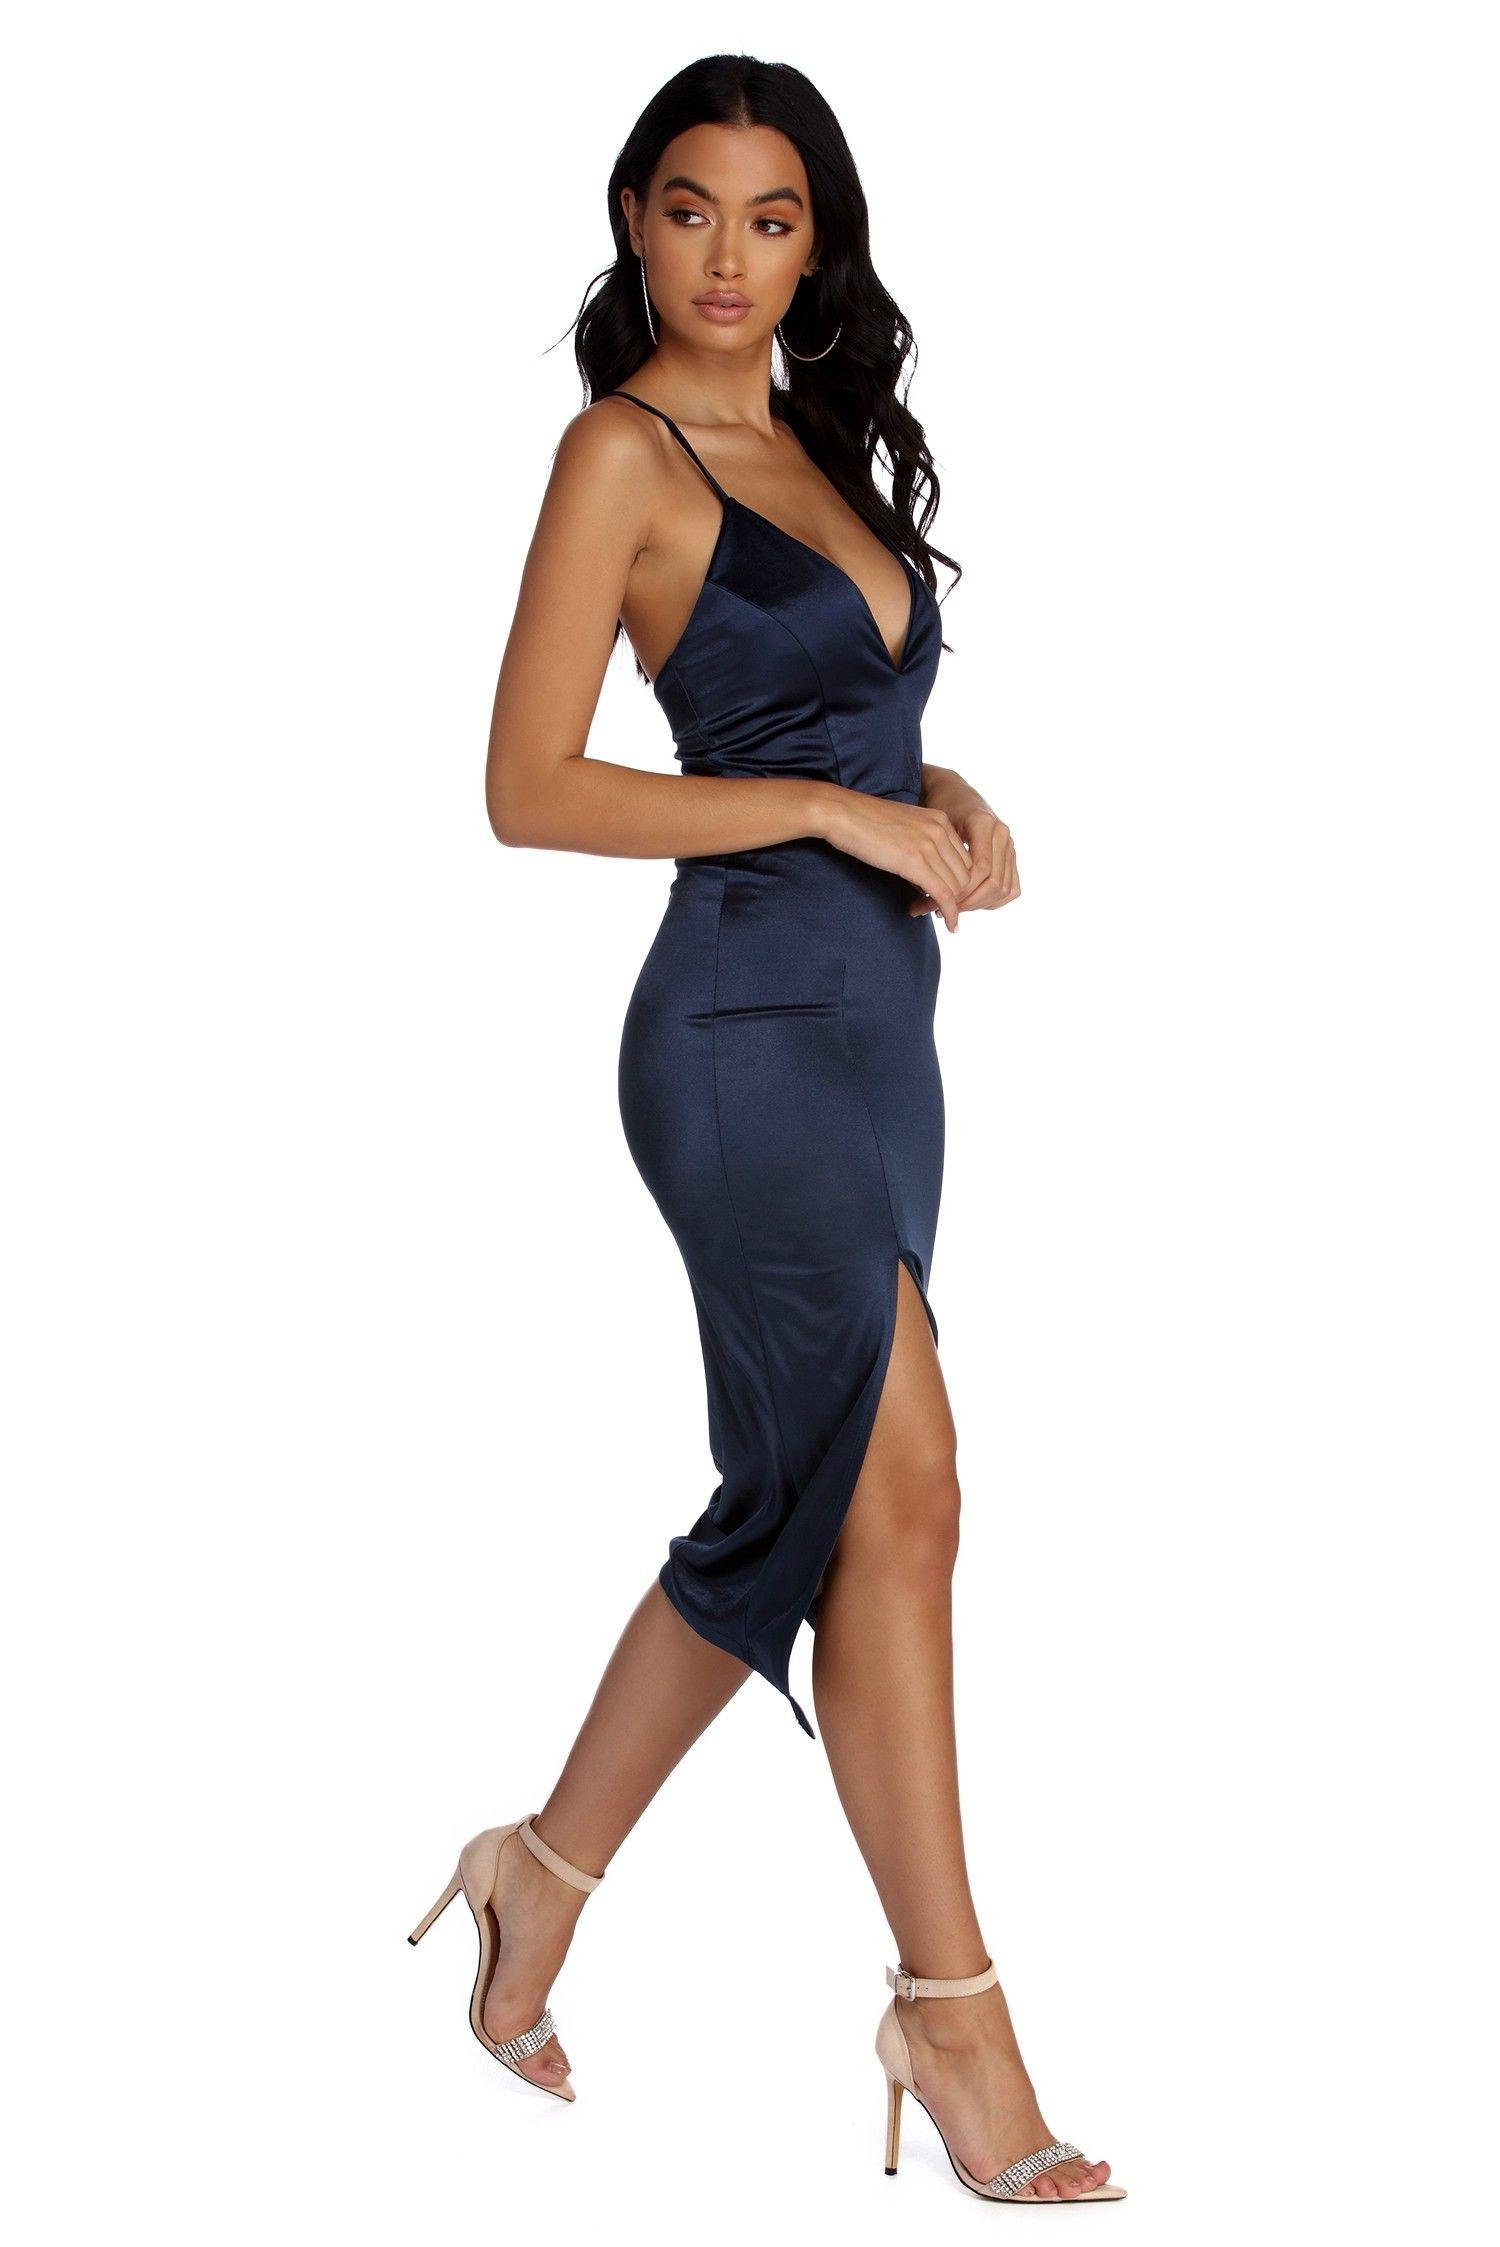 a2bf7f7ee1 Kenzie Formal Lattice Midi Dress in 2019 | Yayers | Dresses, Blue ...